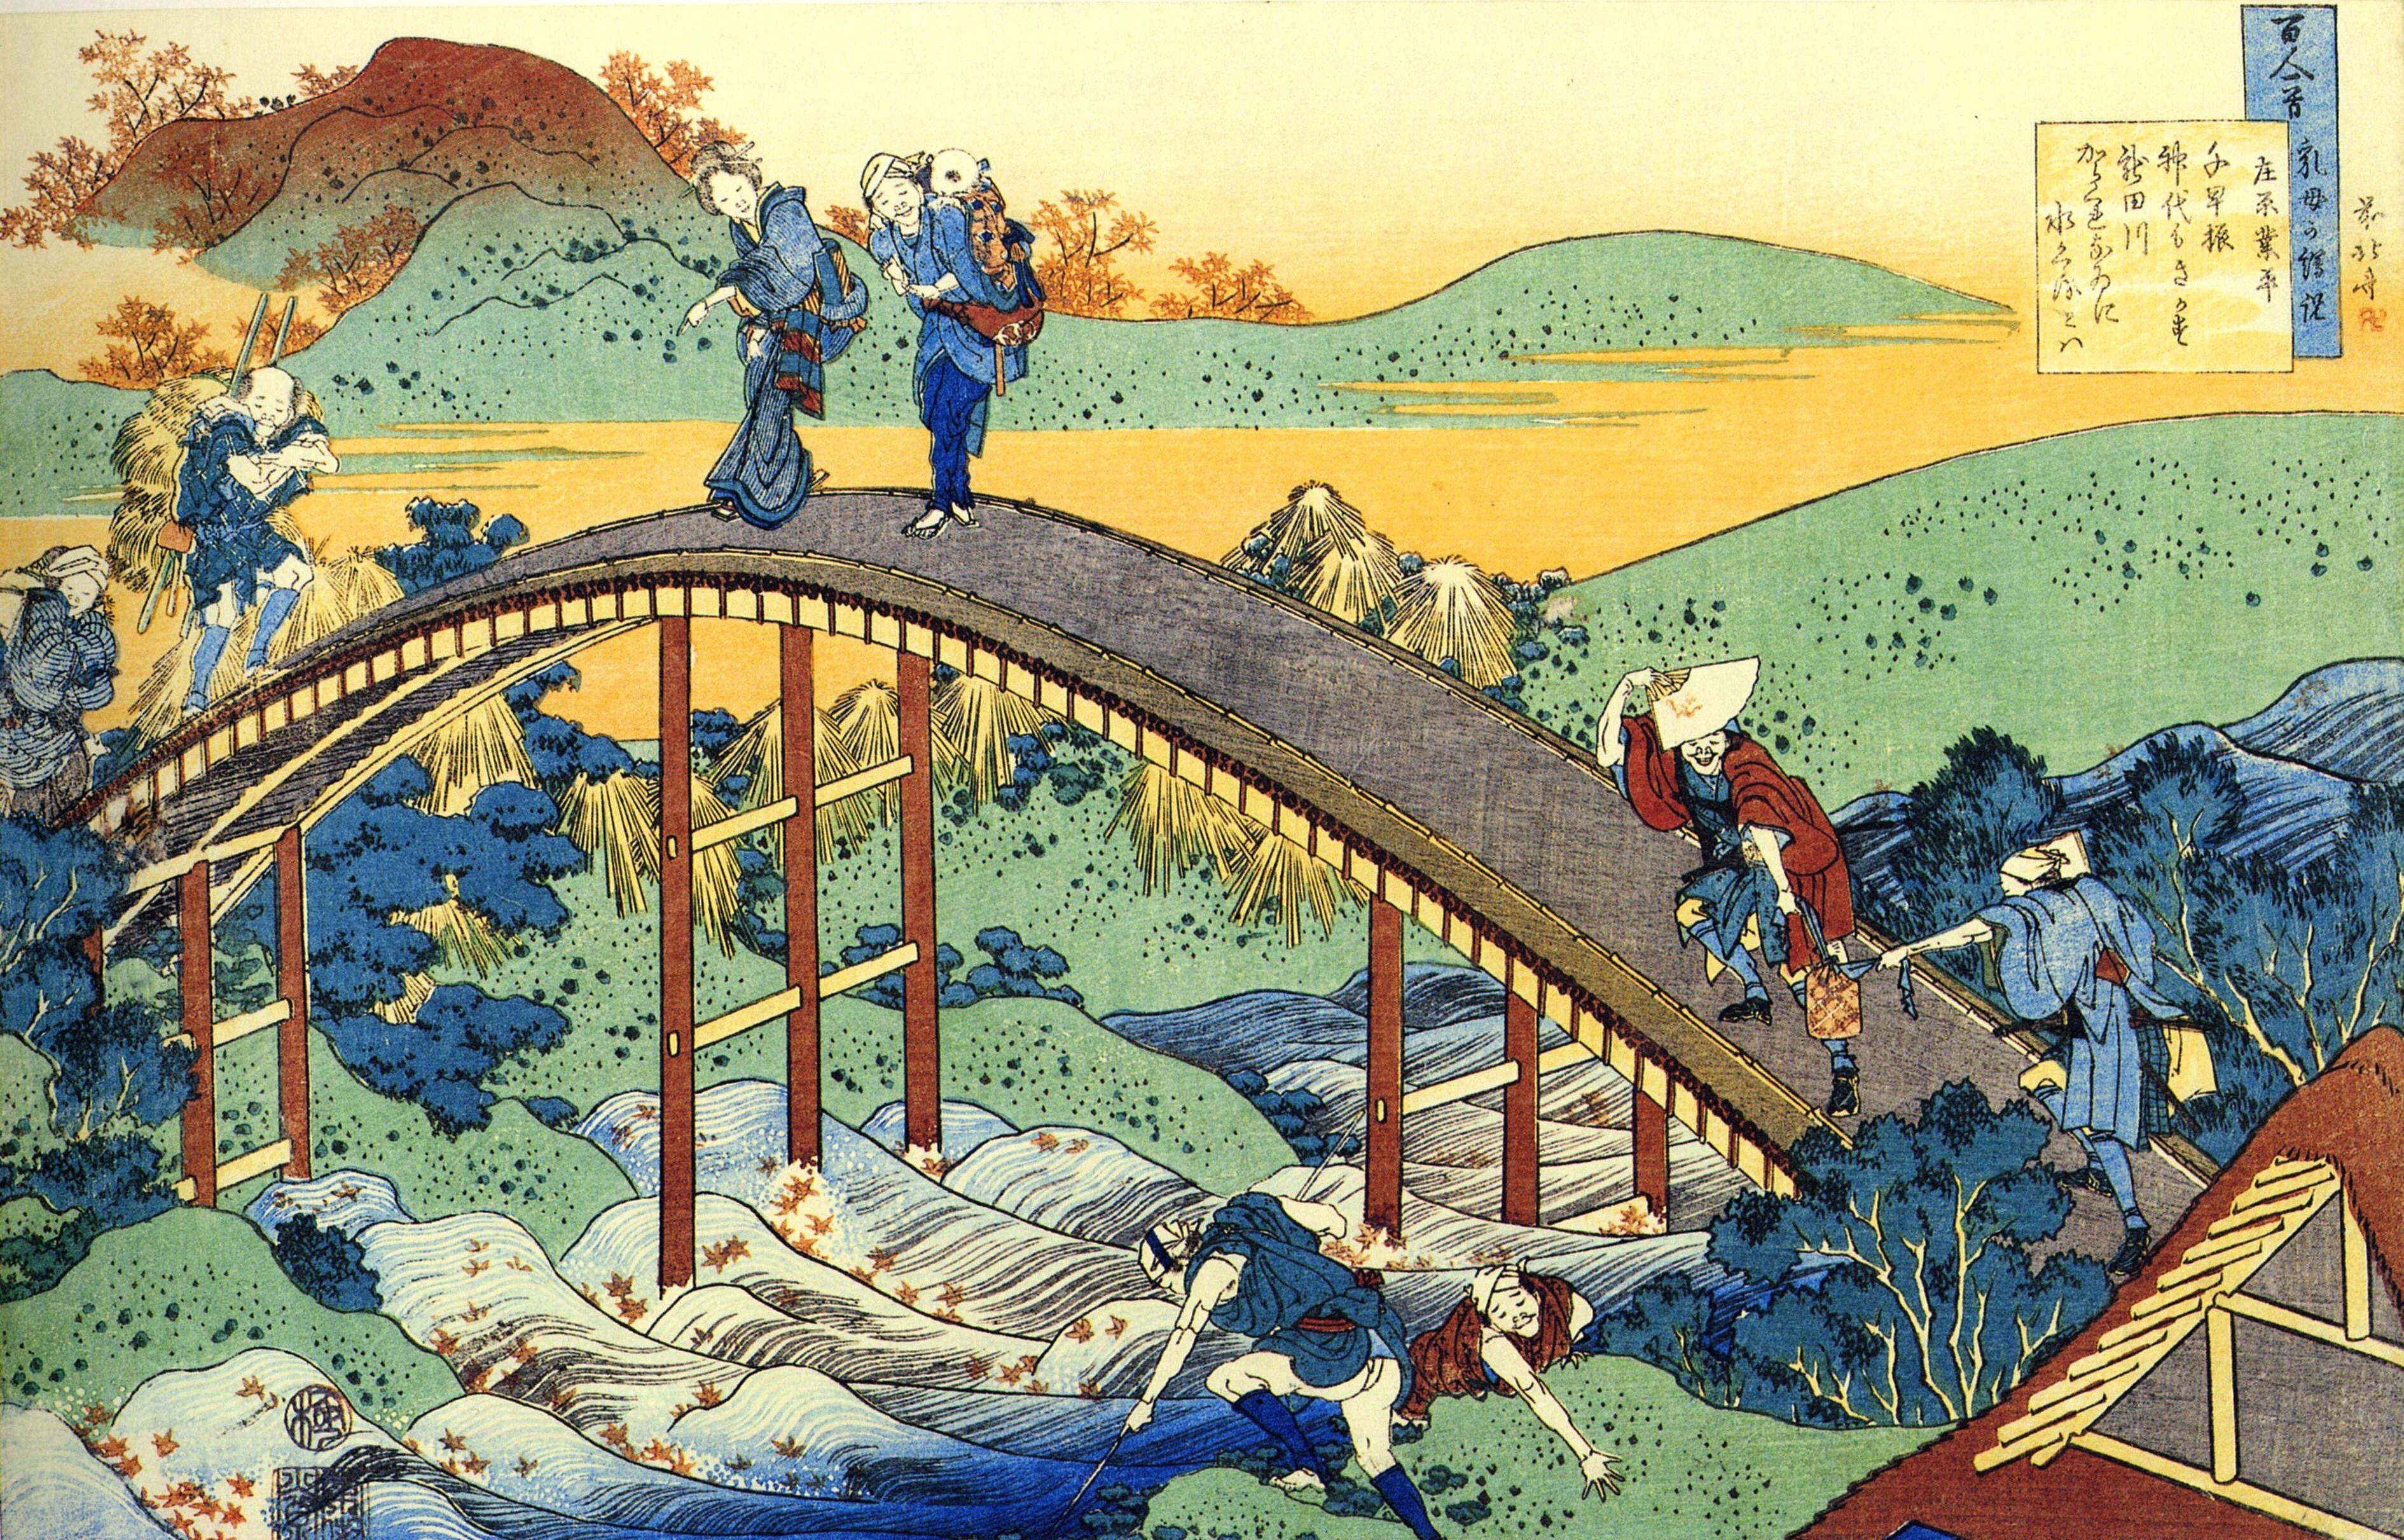 Desktop Wallpaper Hokusai h682536 Comics HD Images 3780x2422